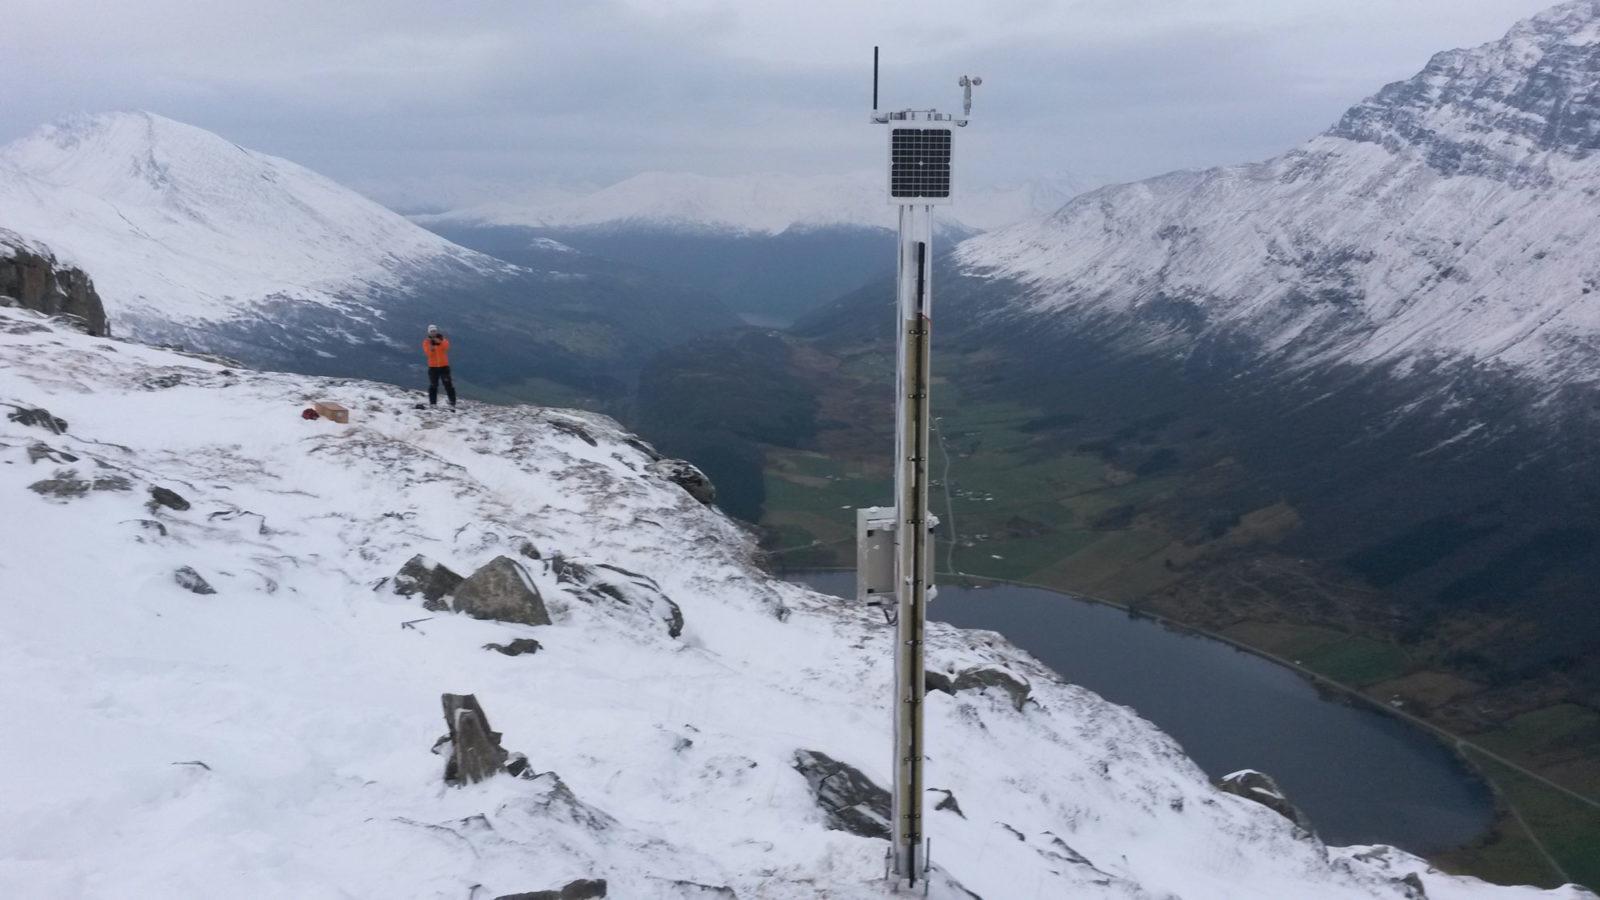 Snow depth measurement device